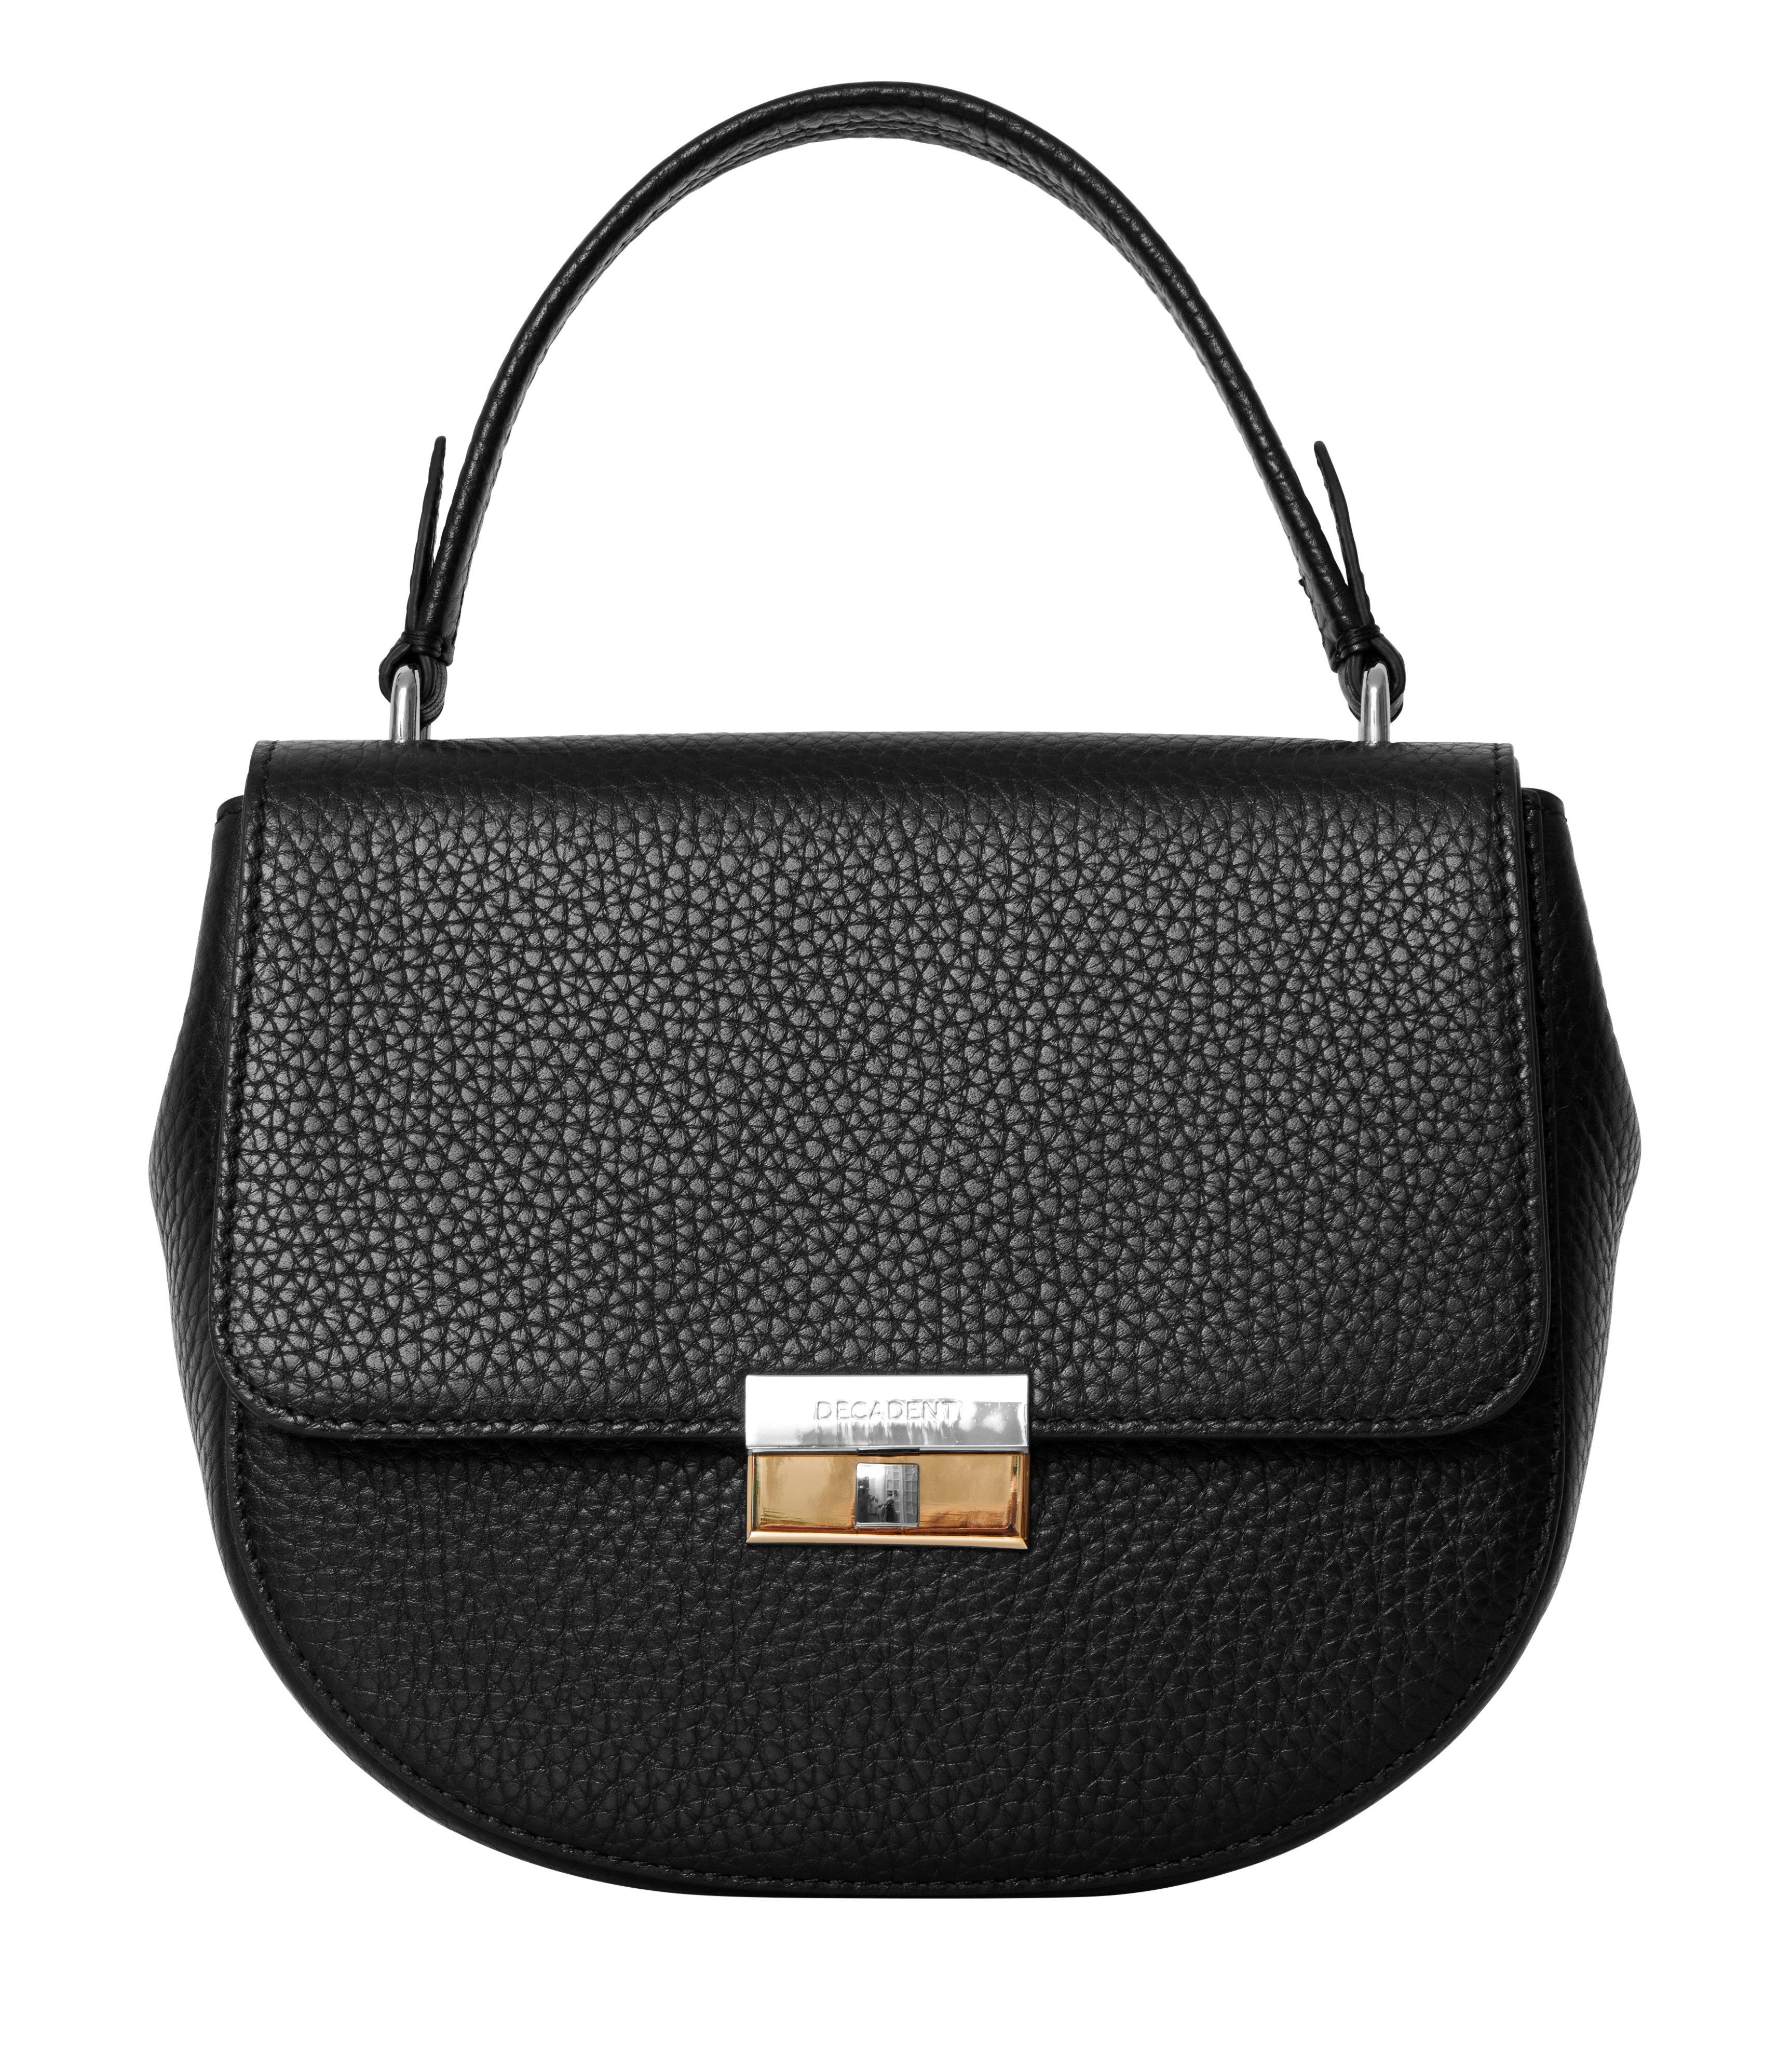 Decadent June Small håndtaske